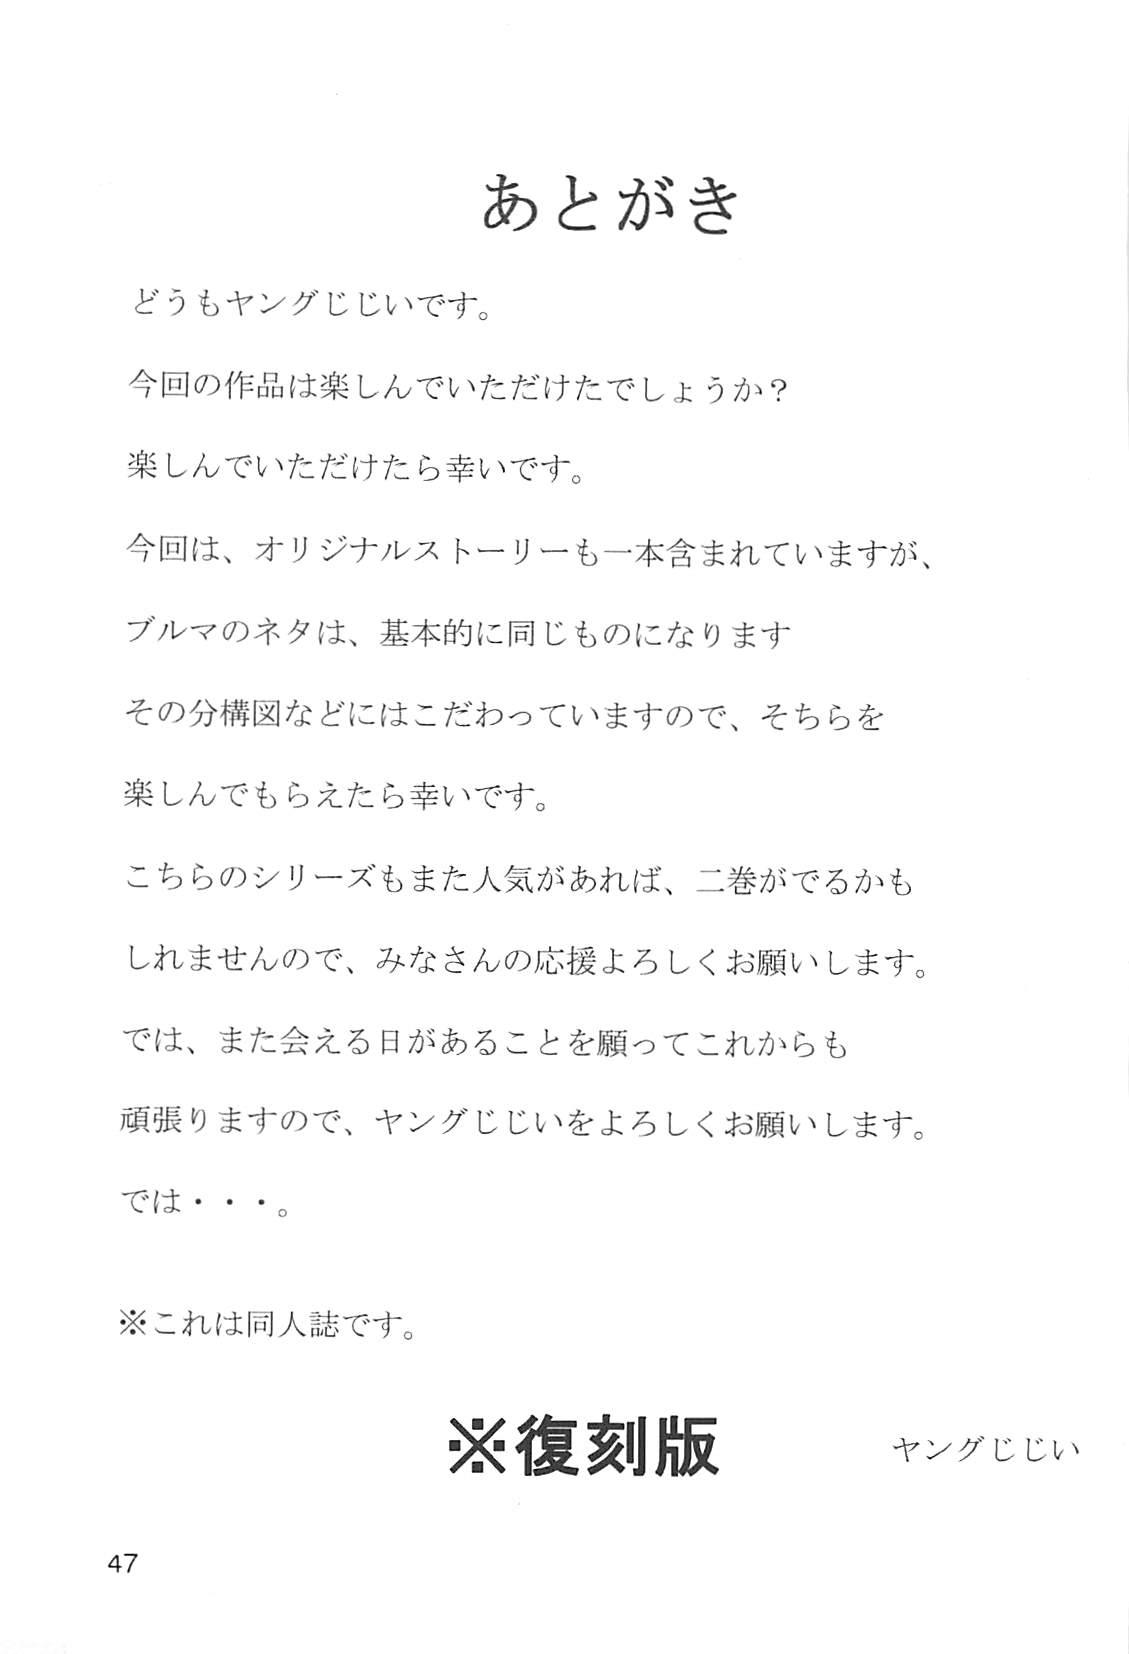 Dragon Ball Girls Collection 1 Fukkokuban 47